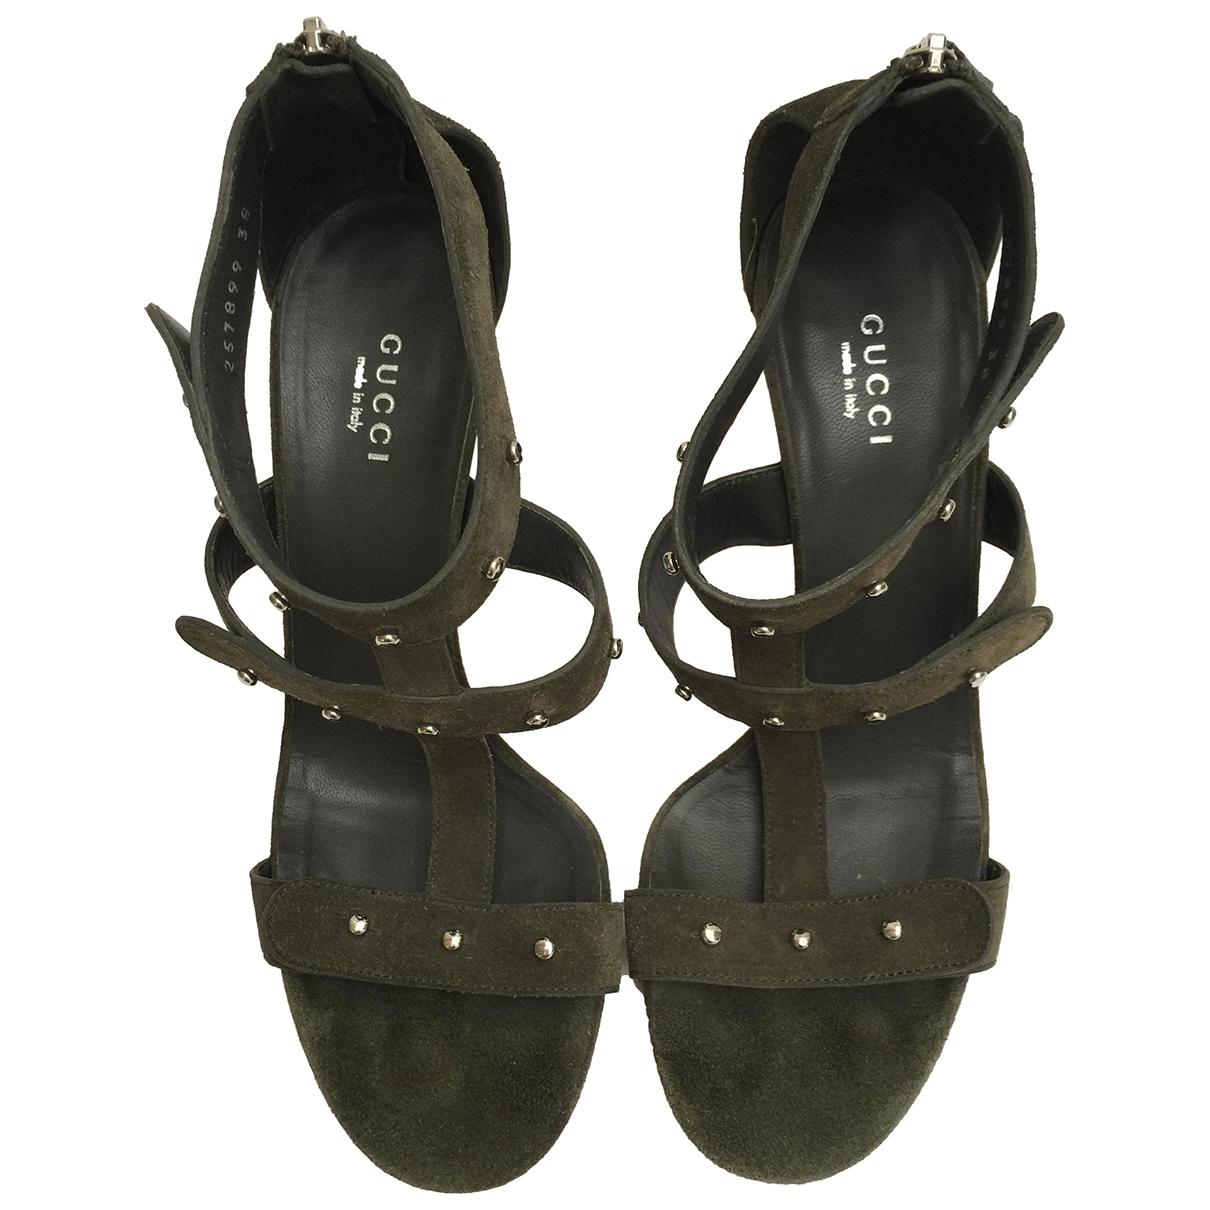 Gucci \N Khaki Suede Sandals for Women 38 EU